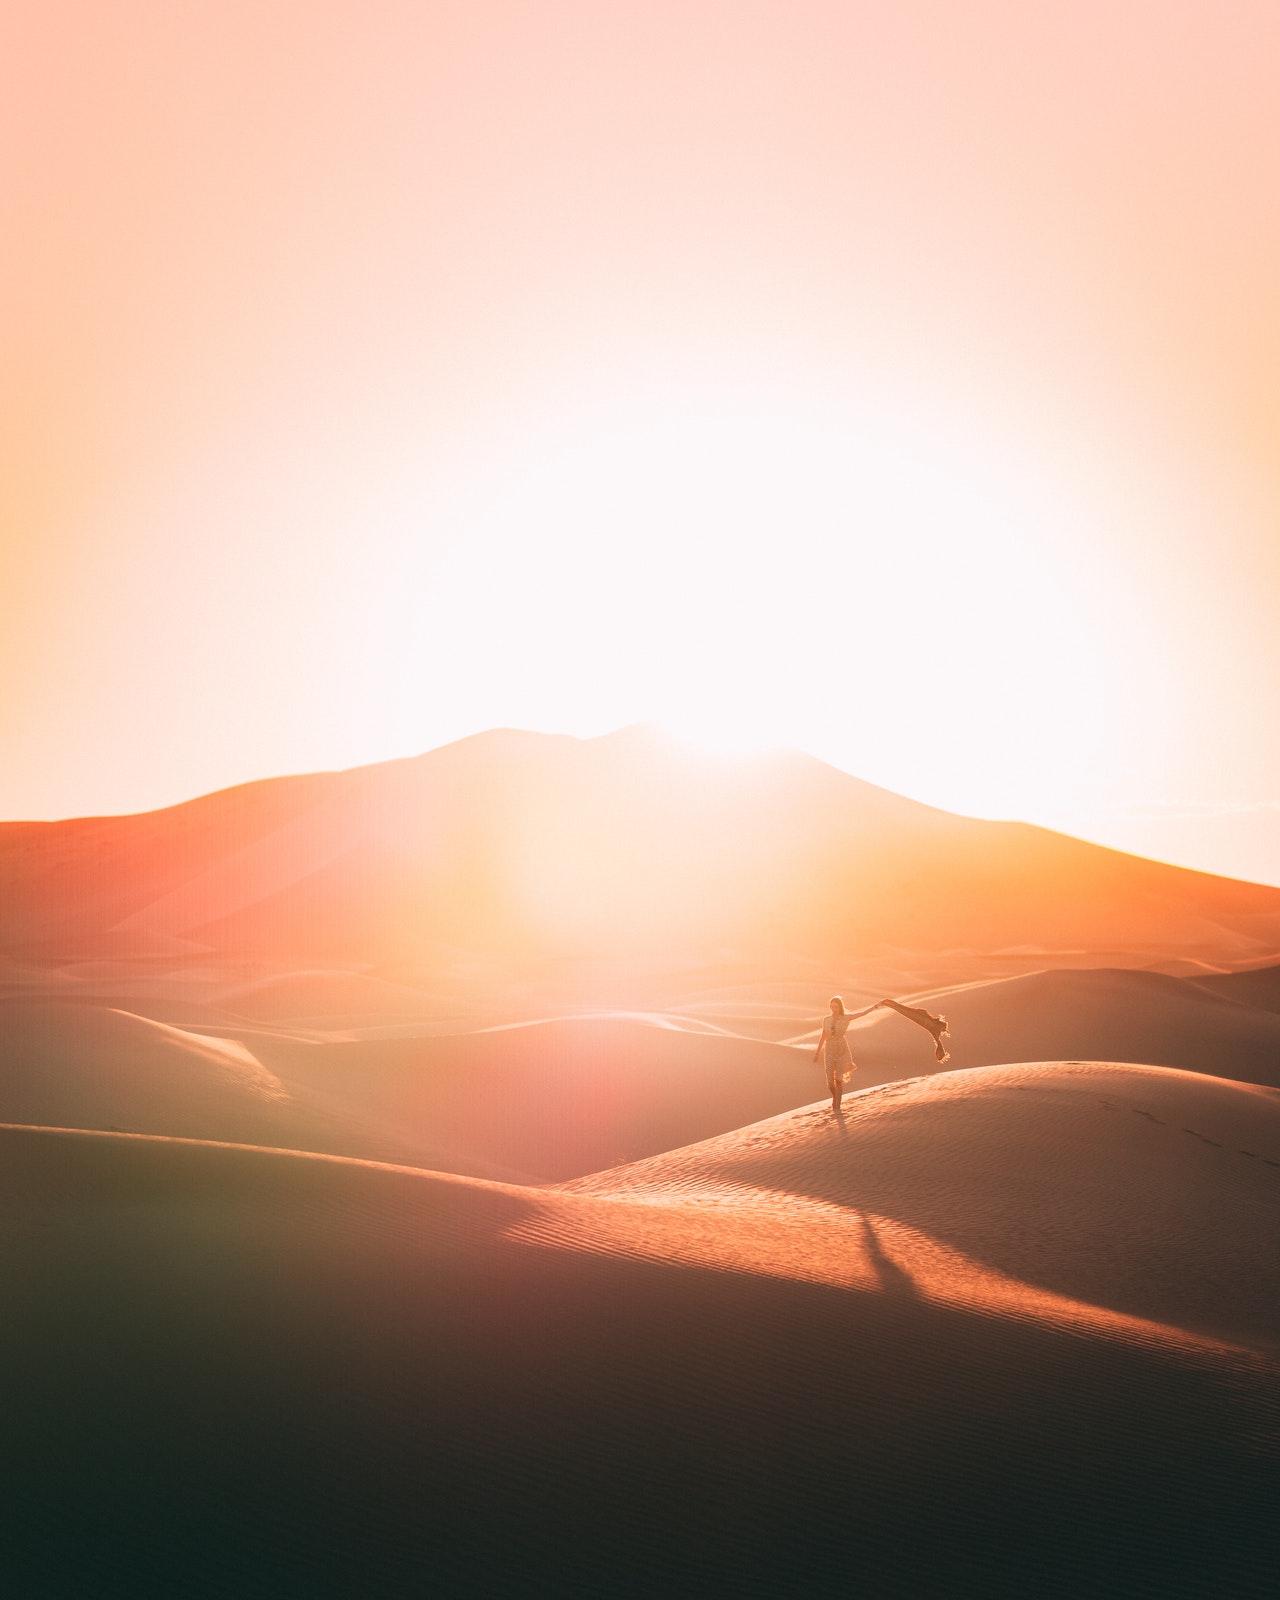 Al Wahat Al Dakhla Desert, Egypt